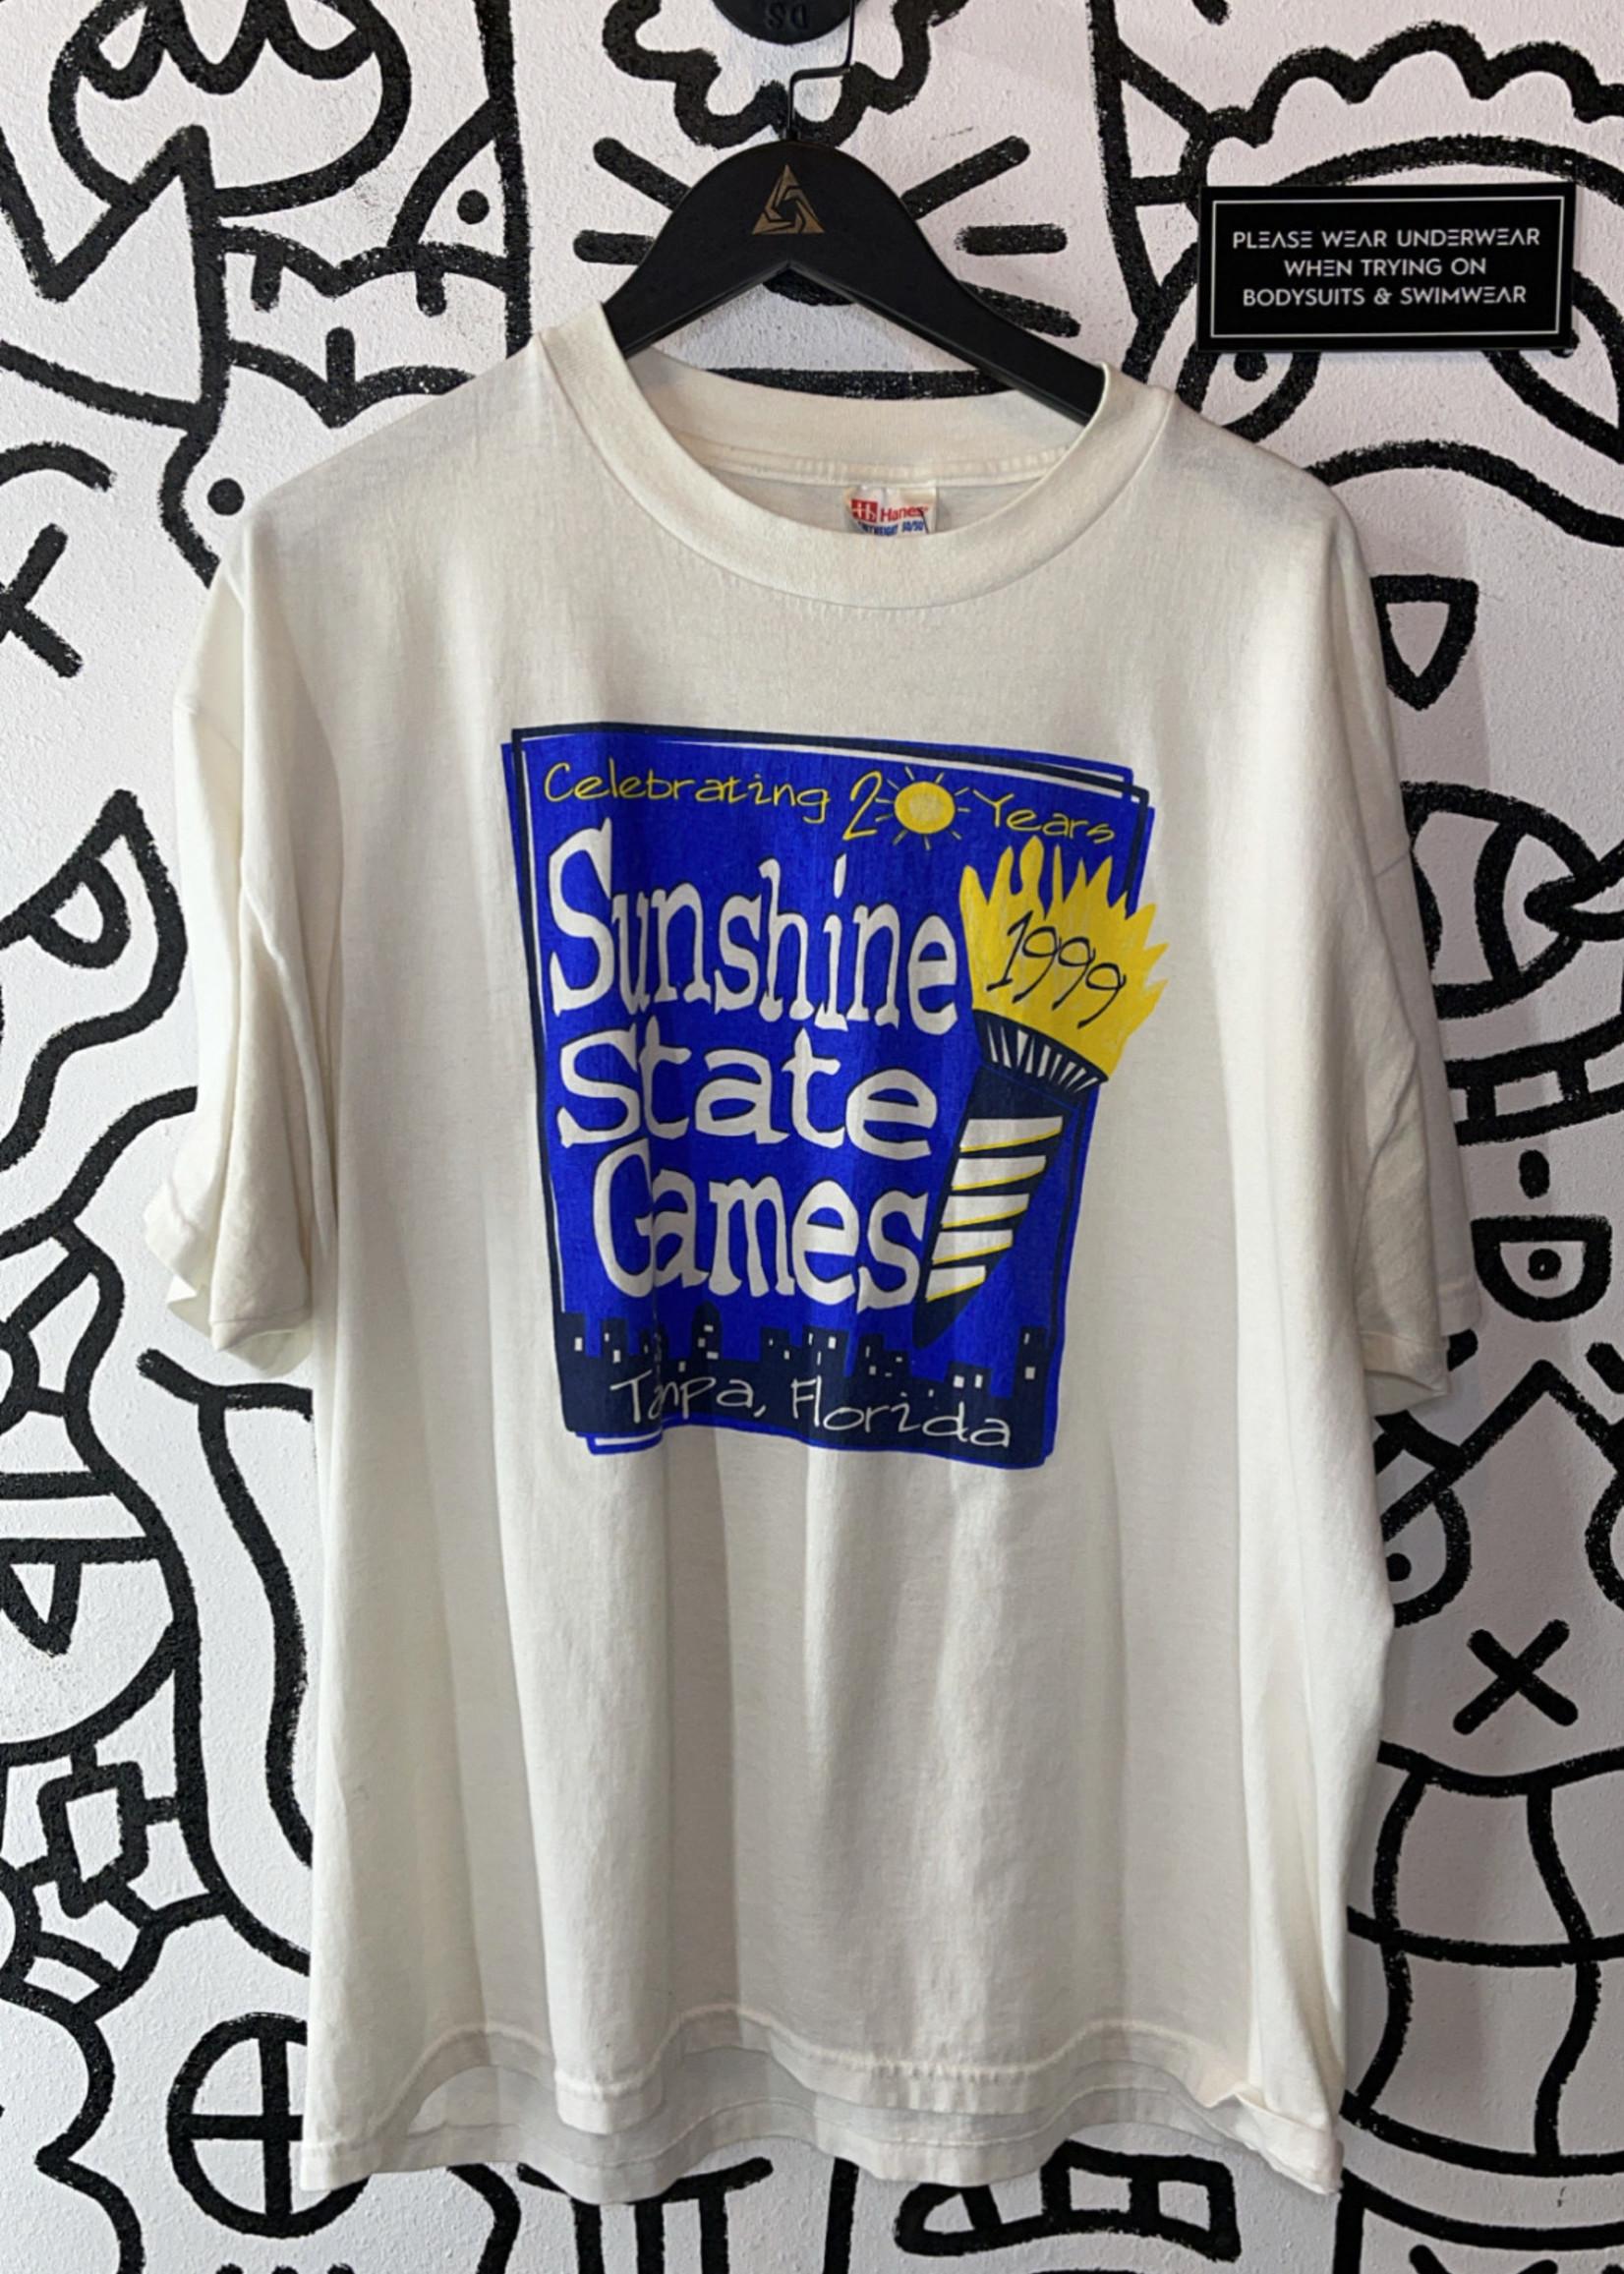 Vintage 1999 Sunshine State Games XL